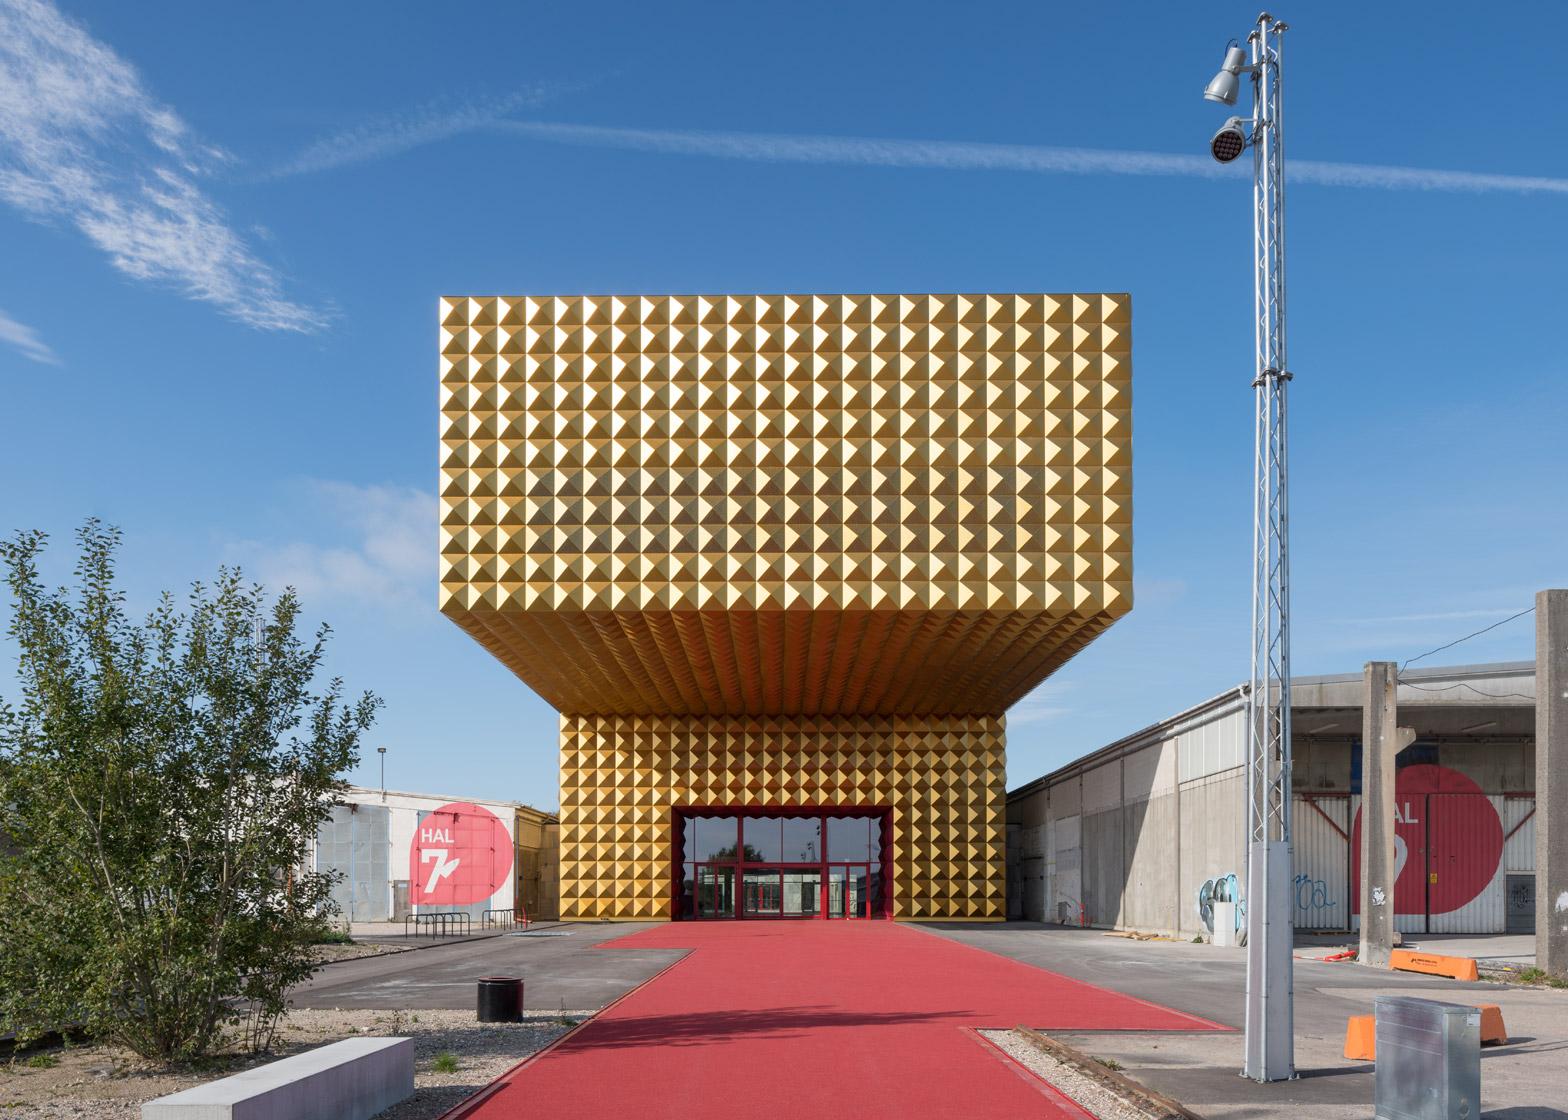 Ragnarock museum by MVRDV and COBE